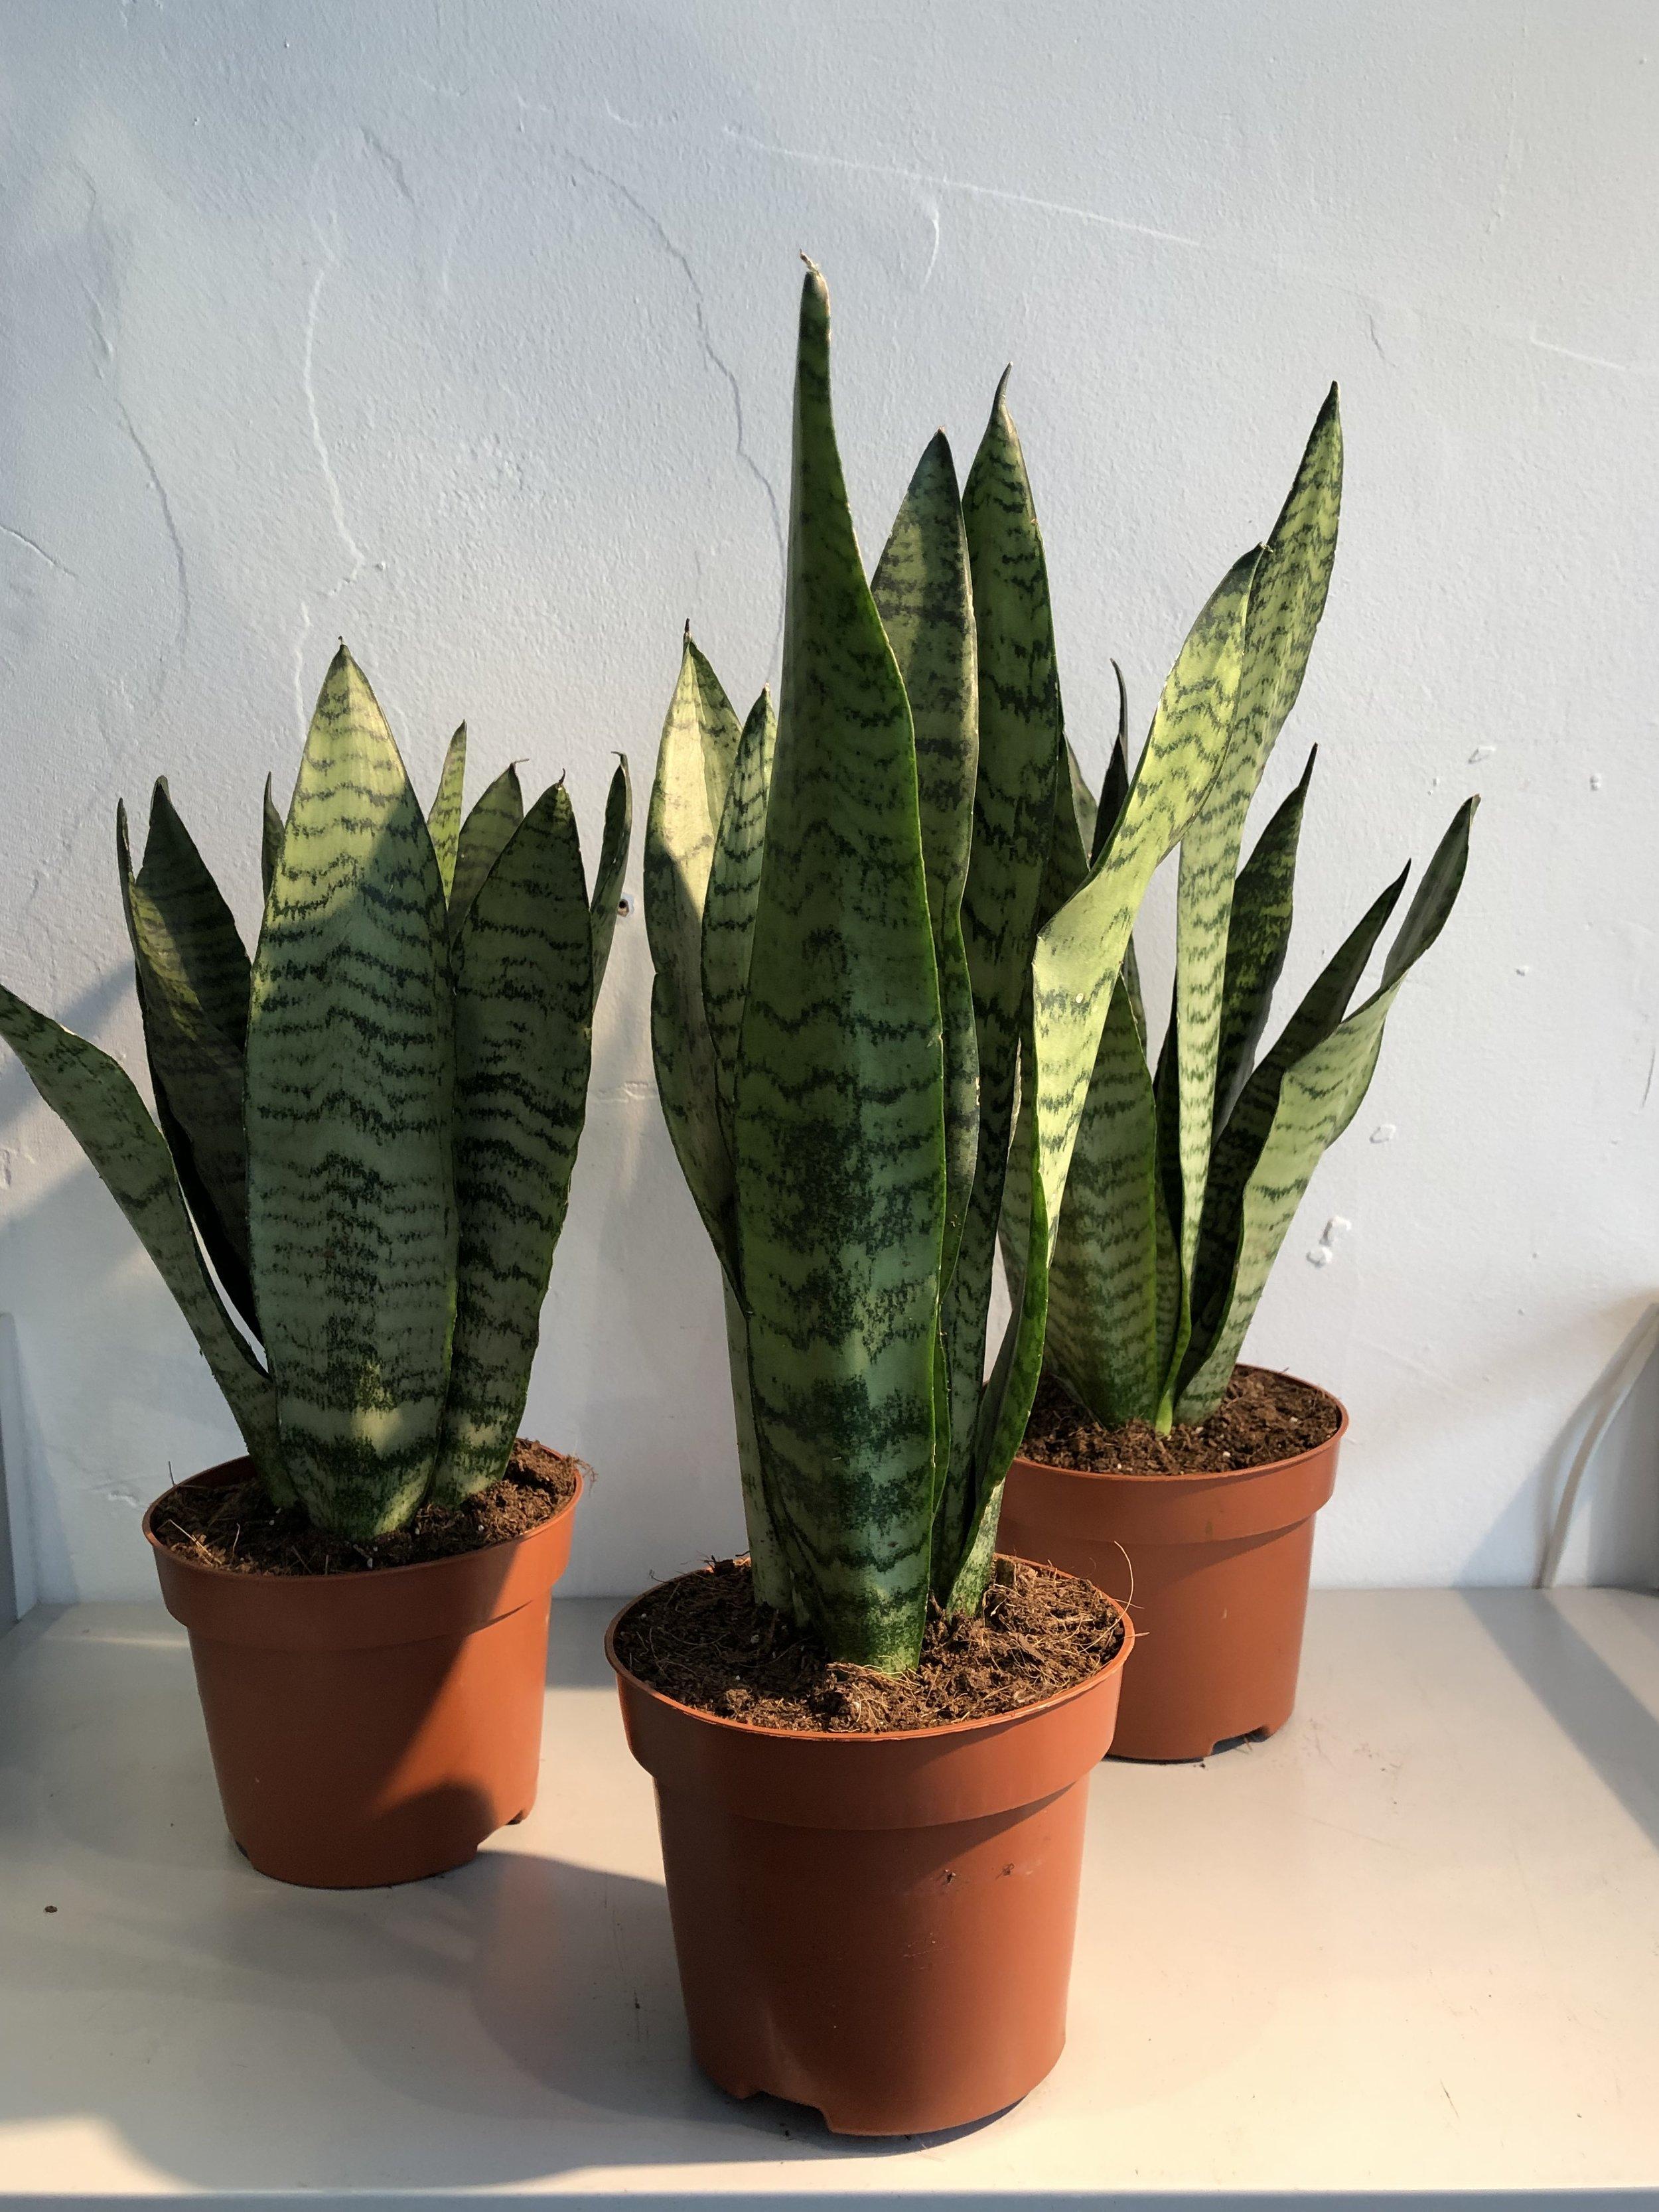 sansevieria, sansevieria trifasciata, sansevieria cylindrica, sansevieria laurentii, sansevieria zeylanica, sansevieria varieties, sansevieria care, sansevieria propagation, sansevieria benefits